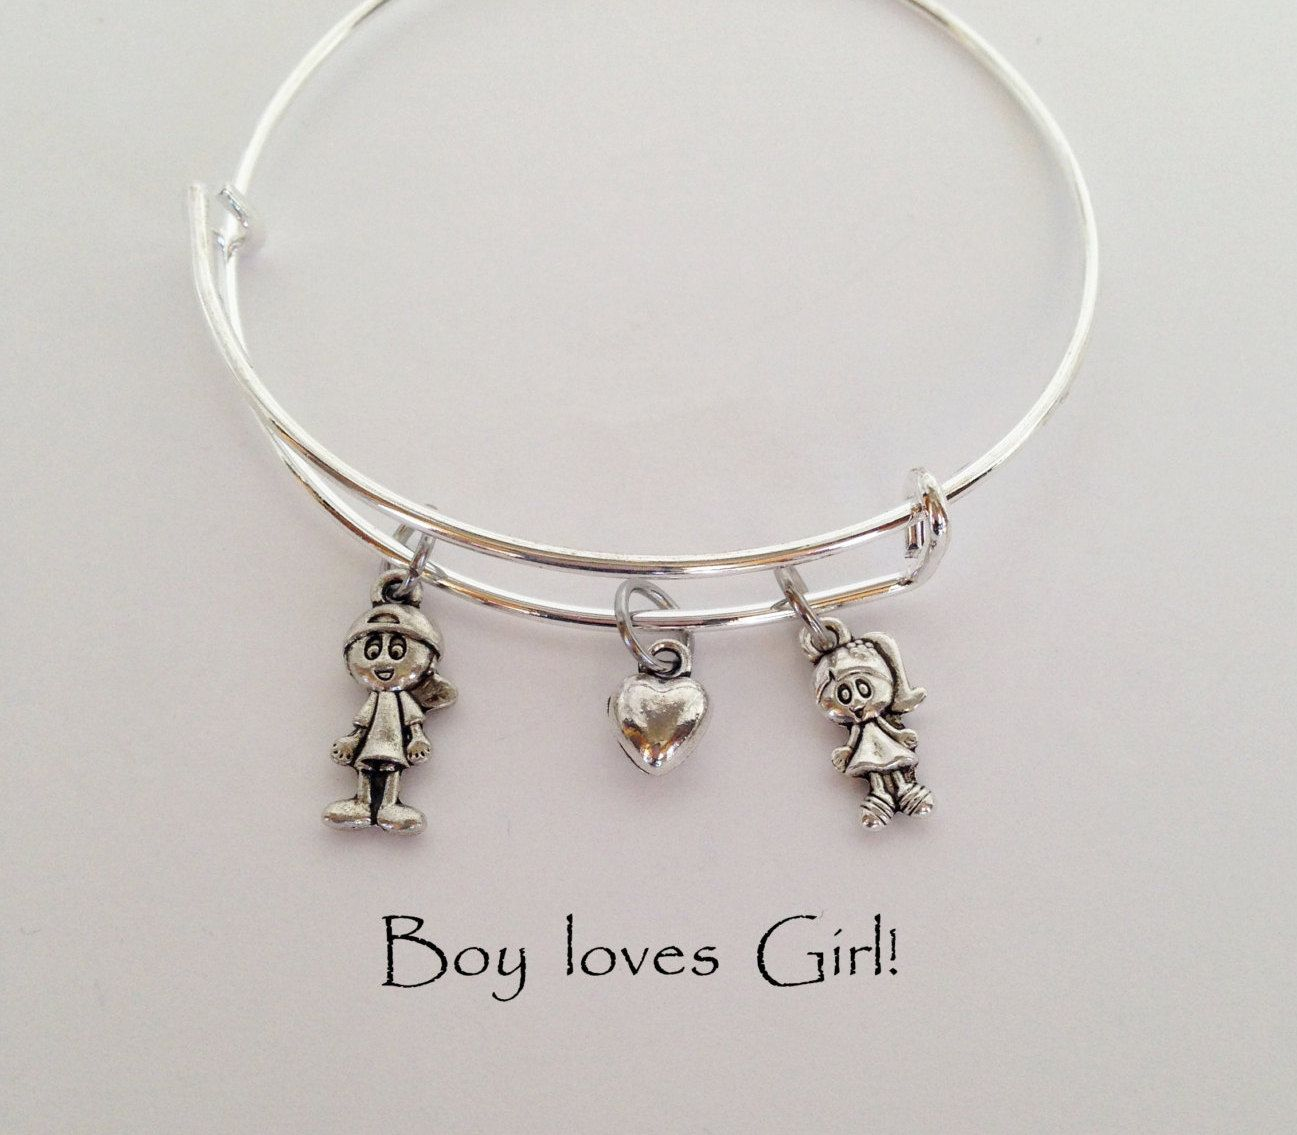 Alex And Ani Inspired Bracelet Gift For Girlfriend Gift For Wife Christmas Gift Gift For Women Gift For Gi Girlfriend Gifts Gifts For Wife Gifts For Girls